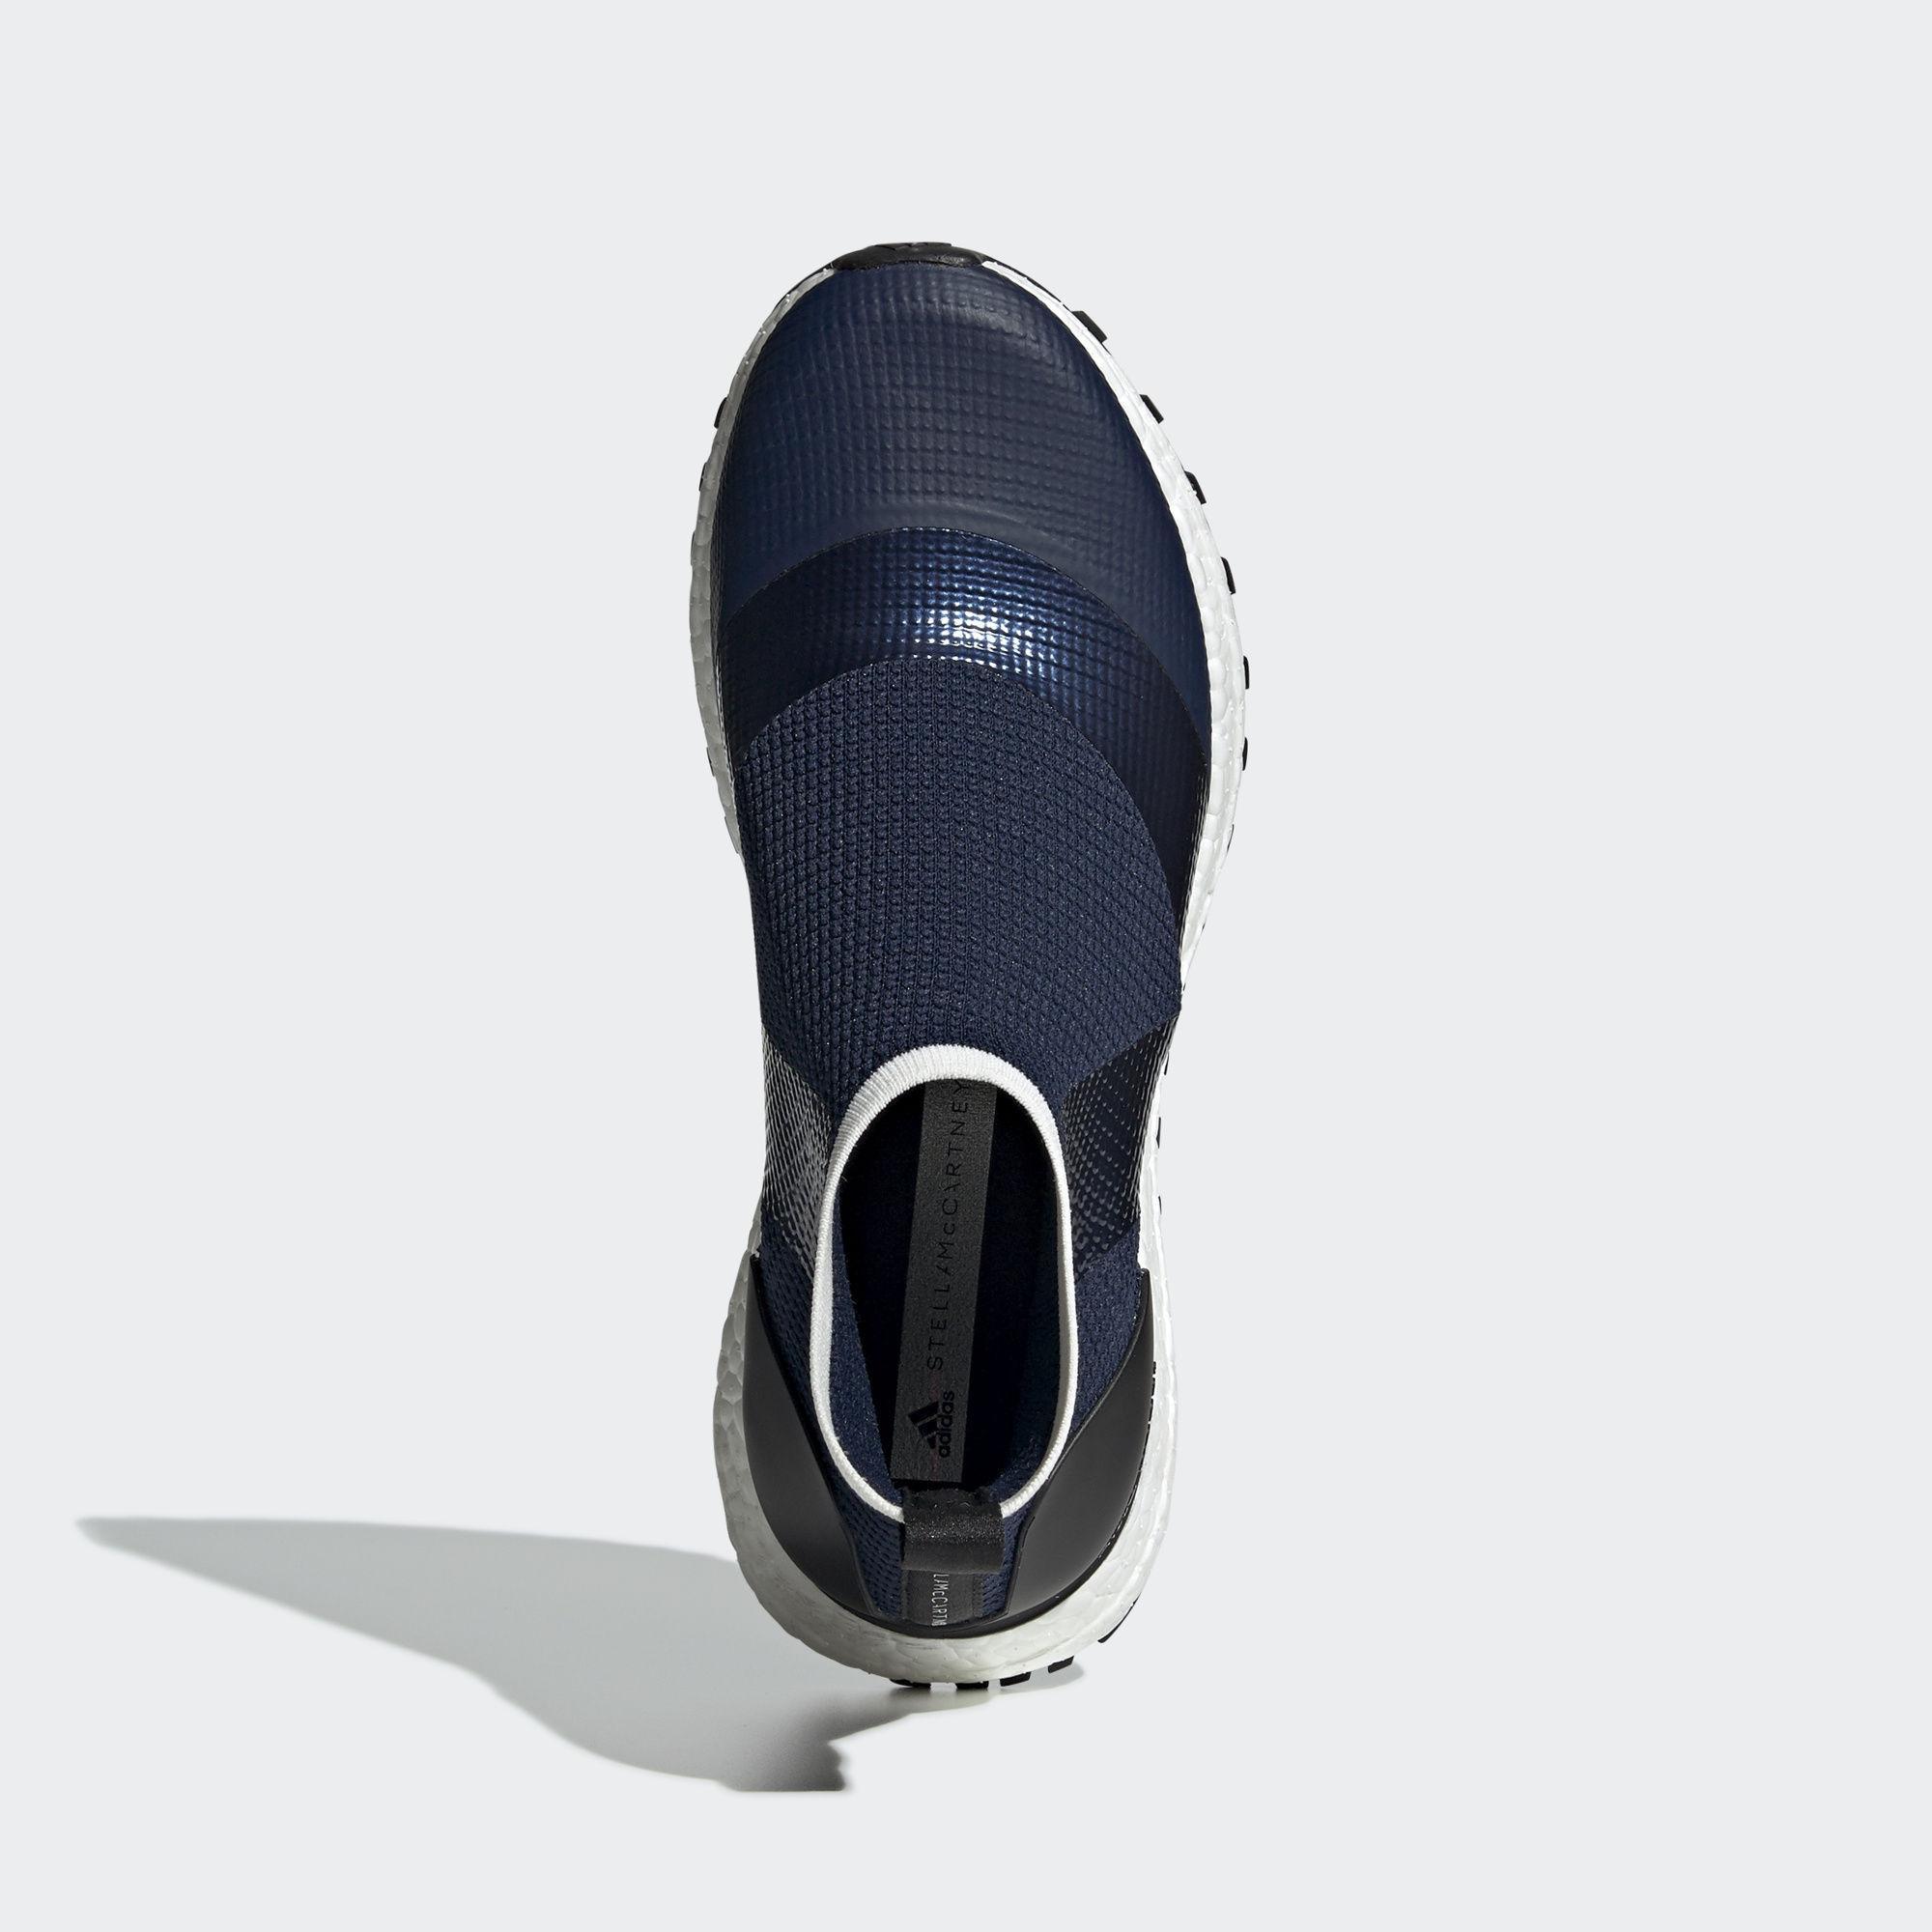 92eaf5ba65c2d Adidas By Stella McCartney - Black + Parley For The Oceans Ultraboost X All  Terrain Metallic. View fullscreen